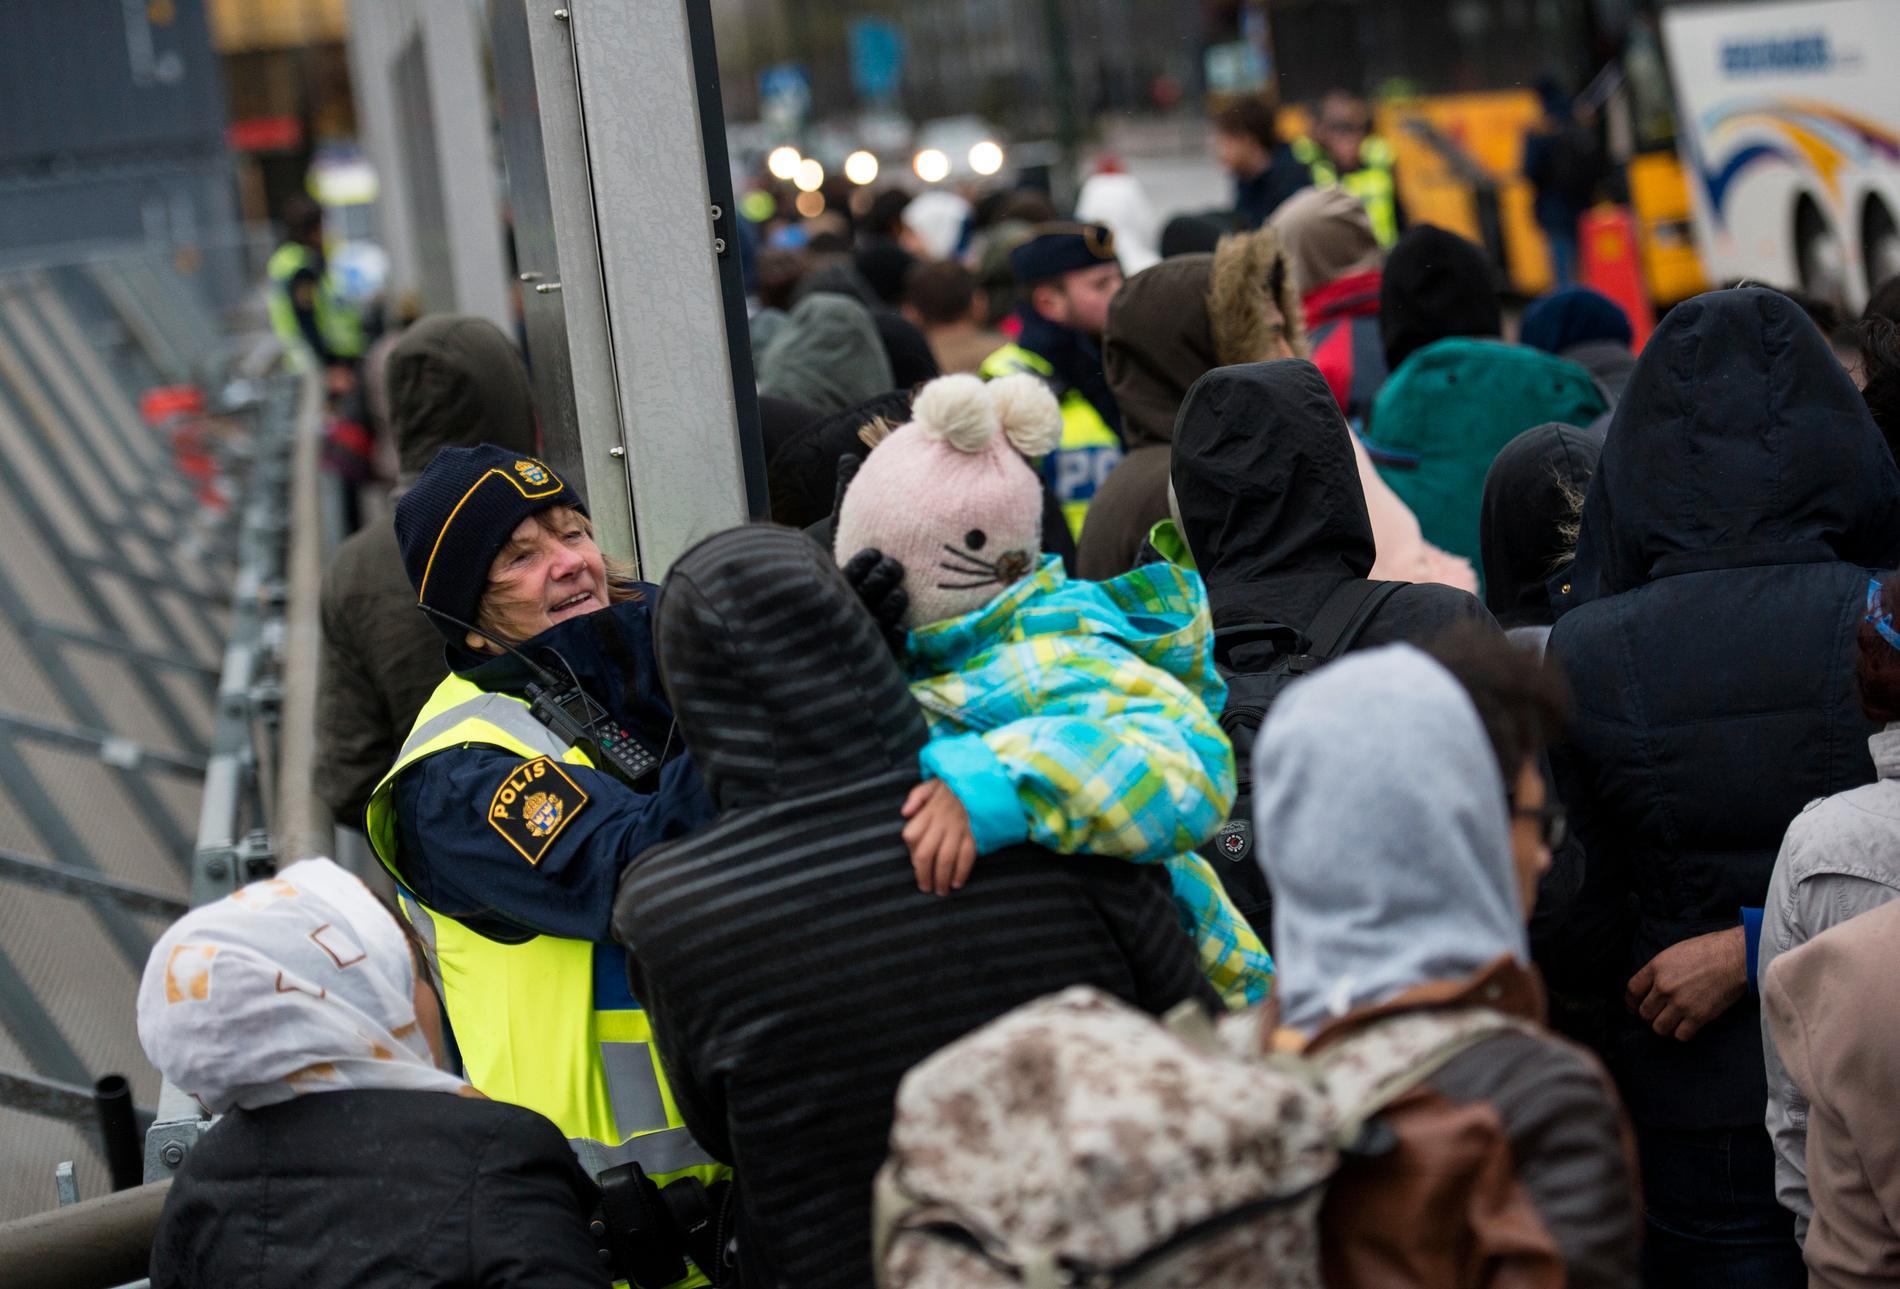 Ankommande flyktingar vid Hyllie station i Malmö, november 2015.